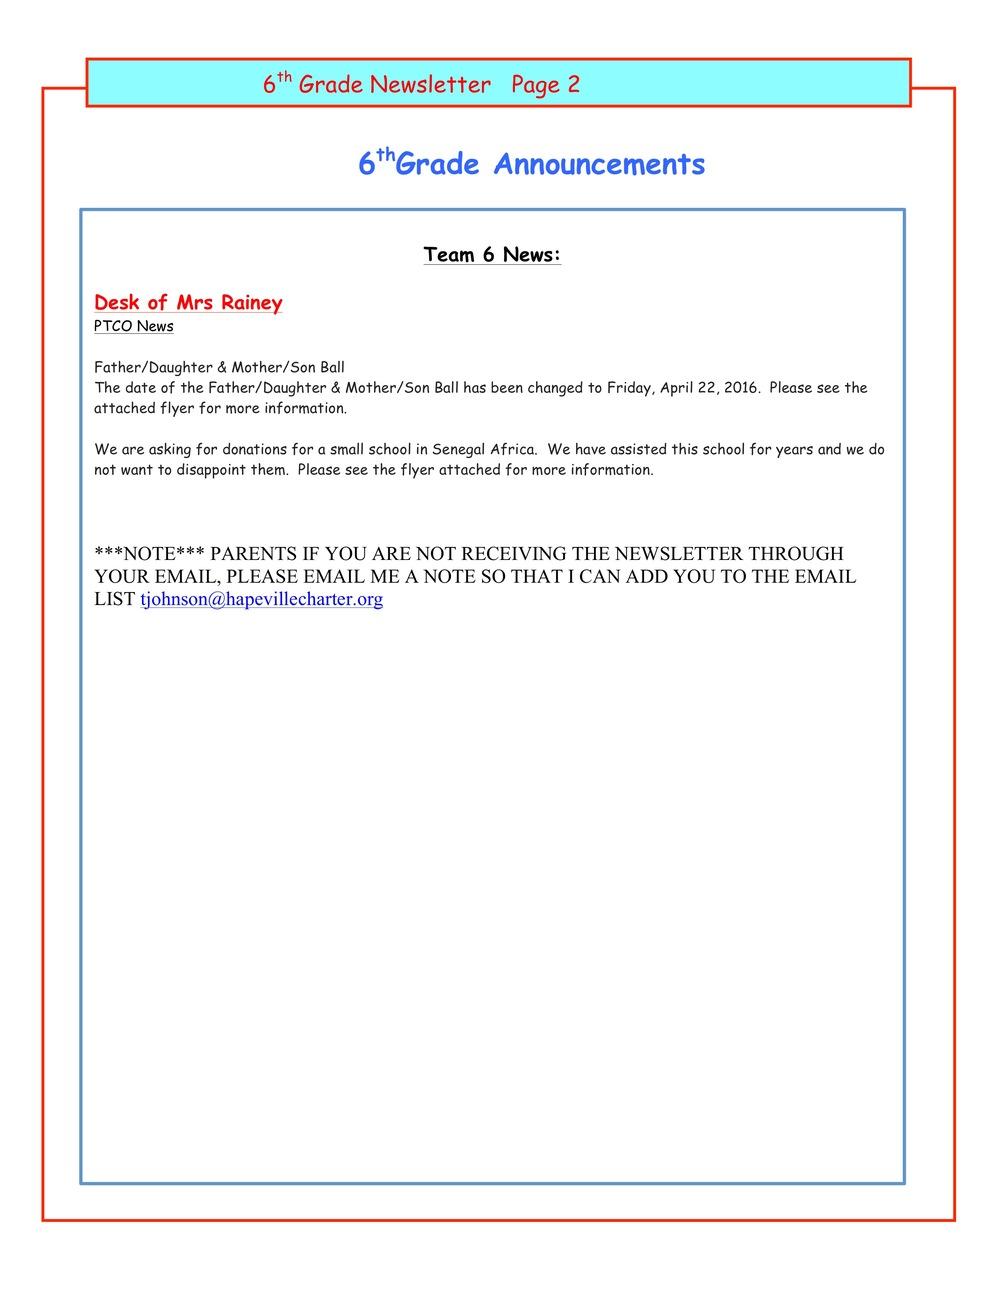 Newsletter Image6th Grade 3-28-2016 2.jpeg